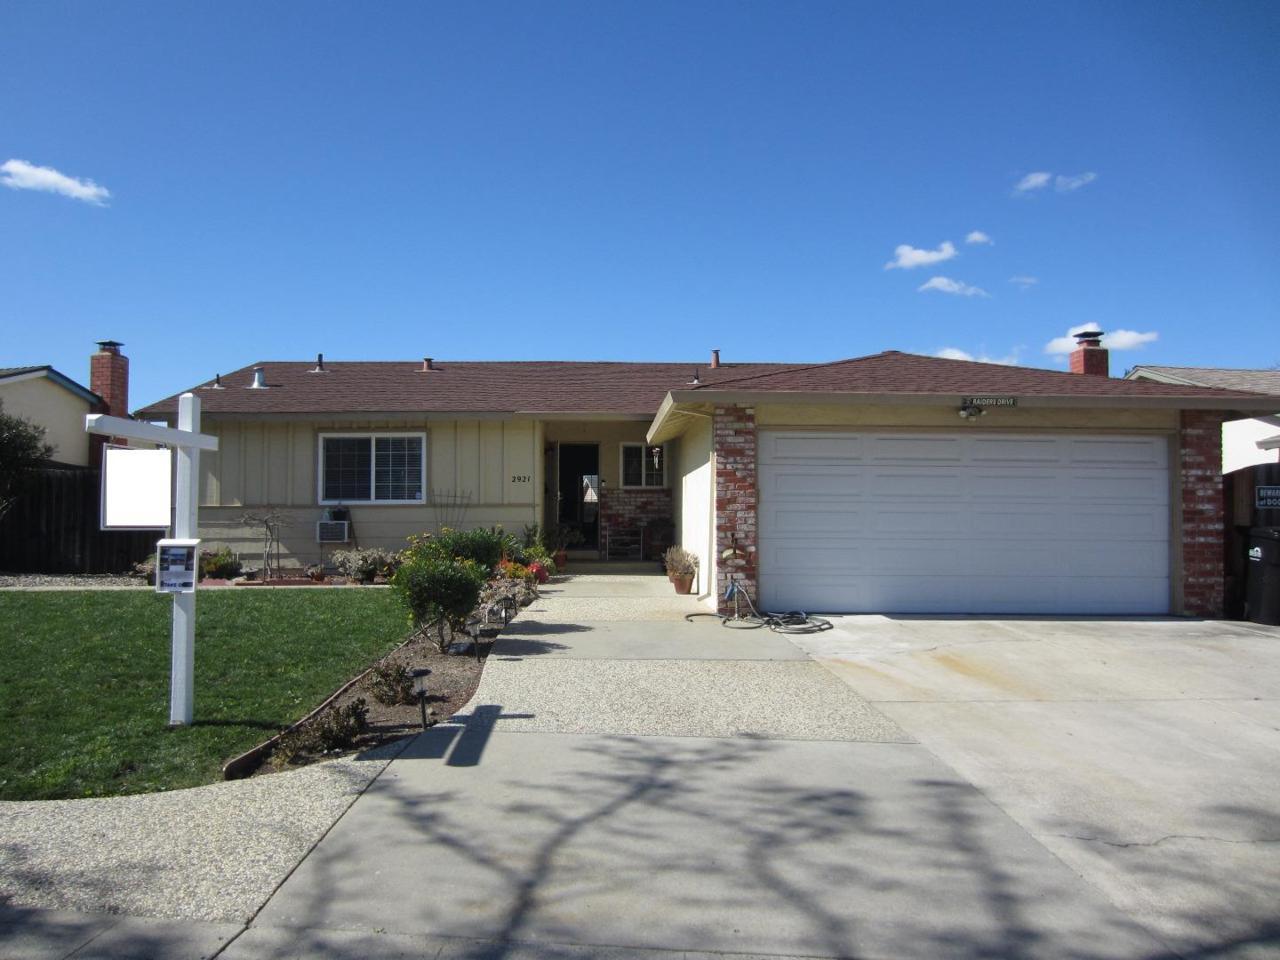 2921 Fairfax Ave, San Jose, CA 95148 (#ML81639169) :: The Goss Real Estate Group, Keller Williams Bay Area Estates